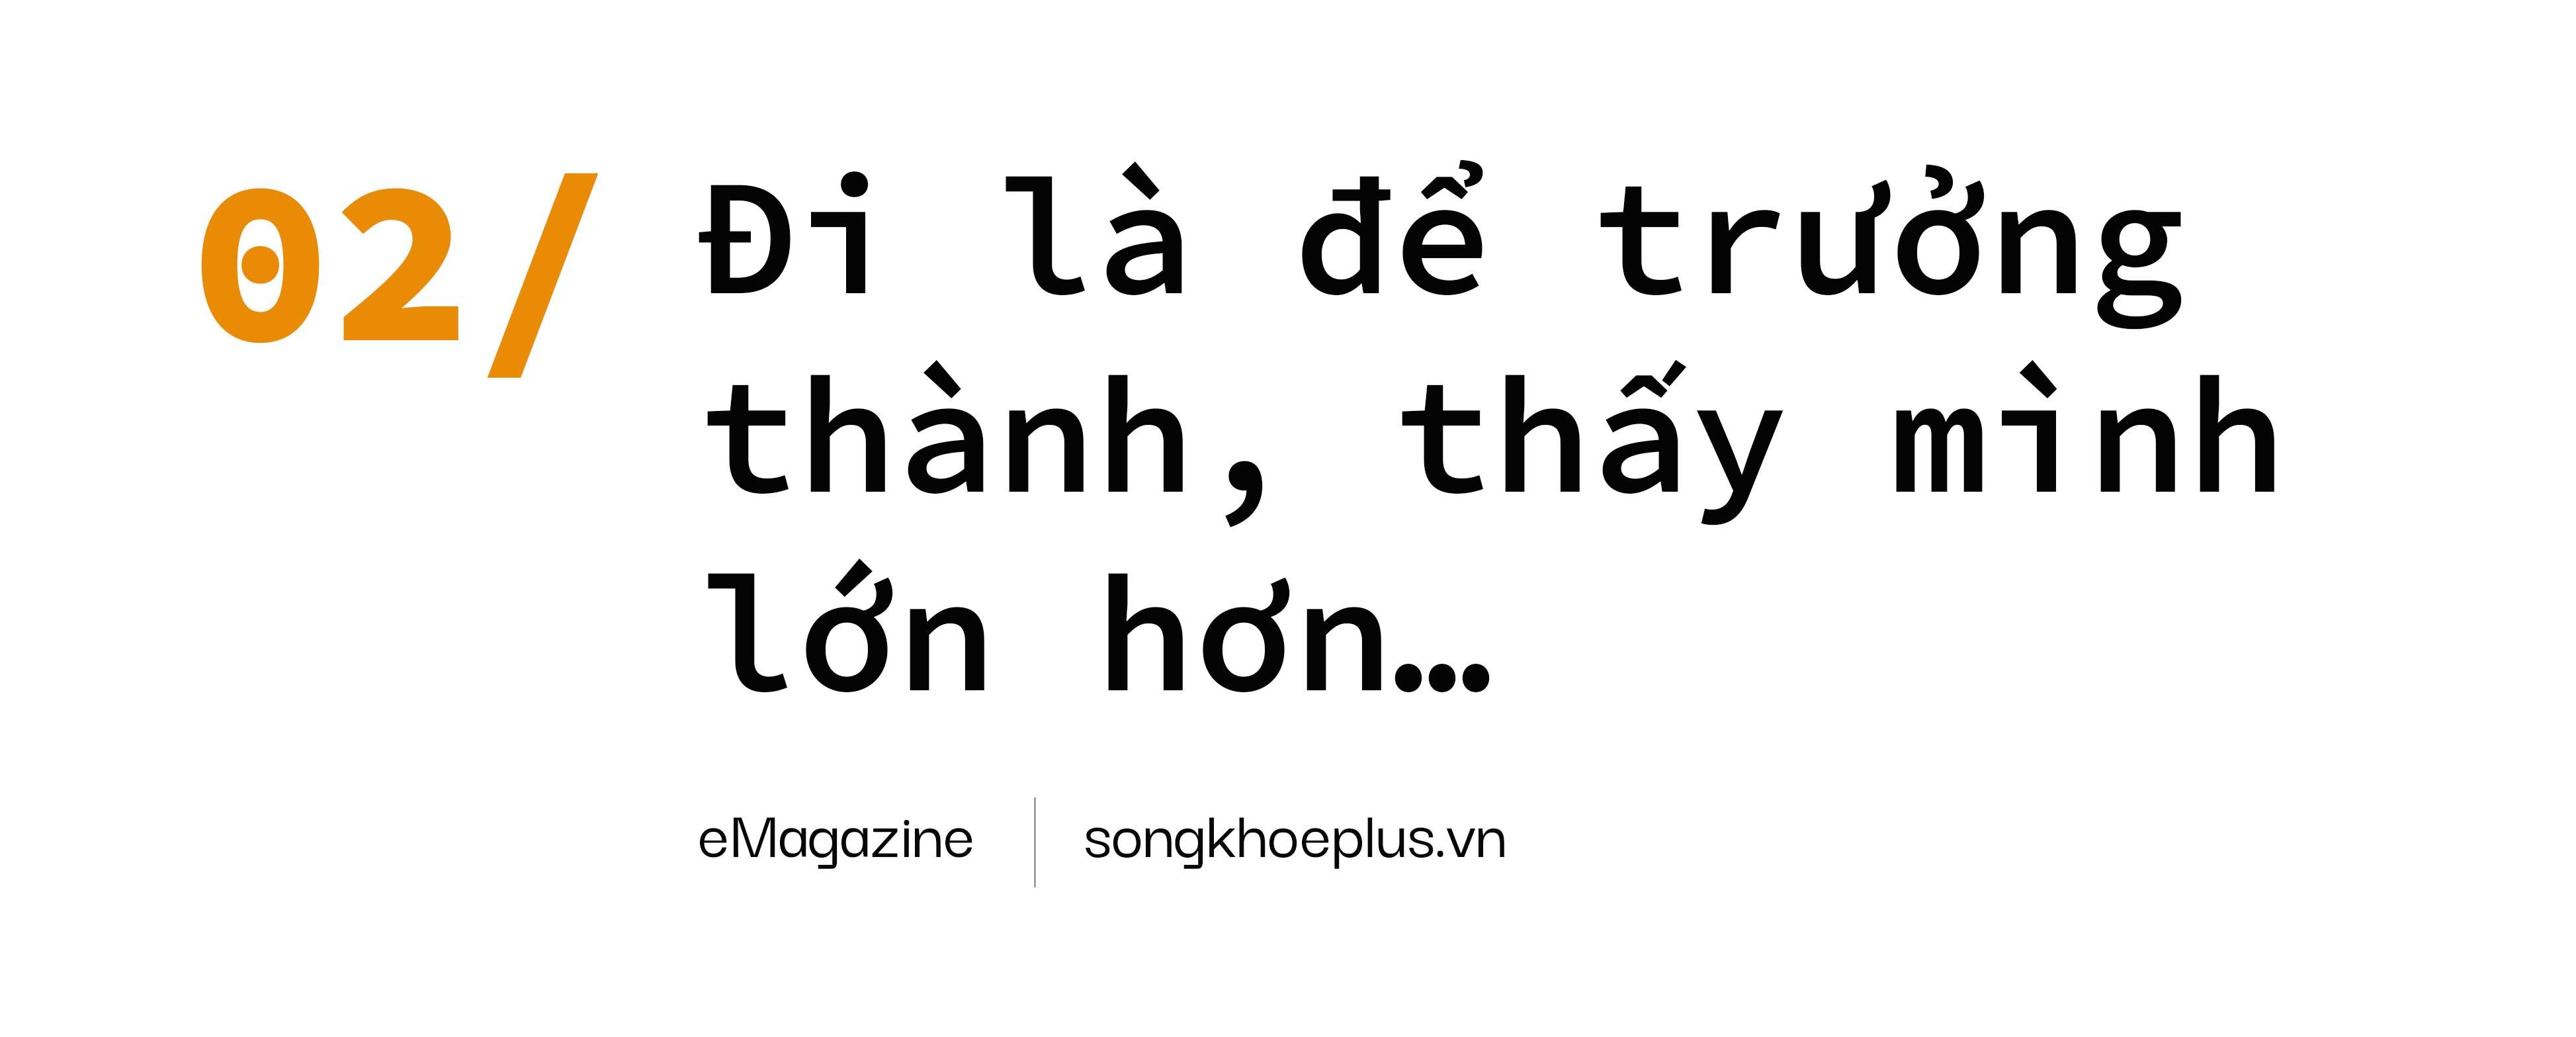 tit-phu-pham-vu-thinh-songkhoe-1621040179.jpg